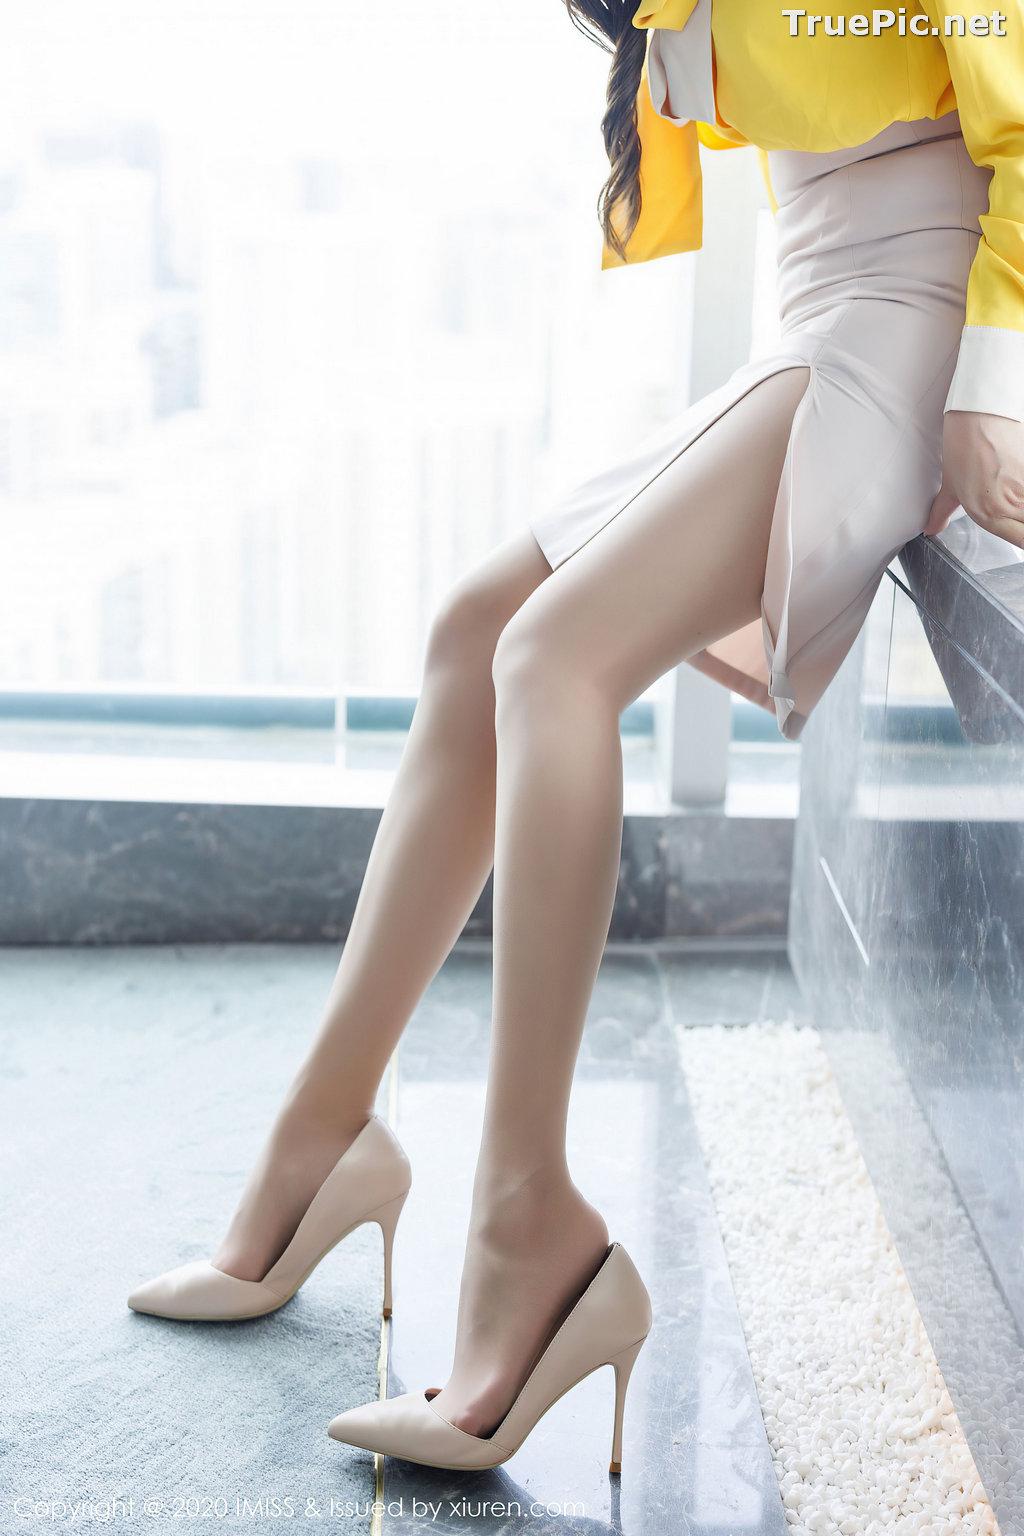 Image IMISS Vol.494 - Chinese Model - Lavinia肉肉 - Beautiful Long Legs Secretary - TruePic.net - Picture-9